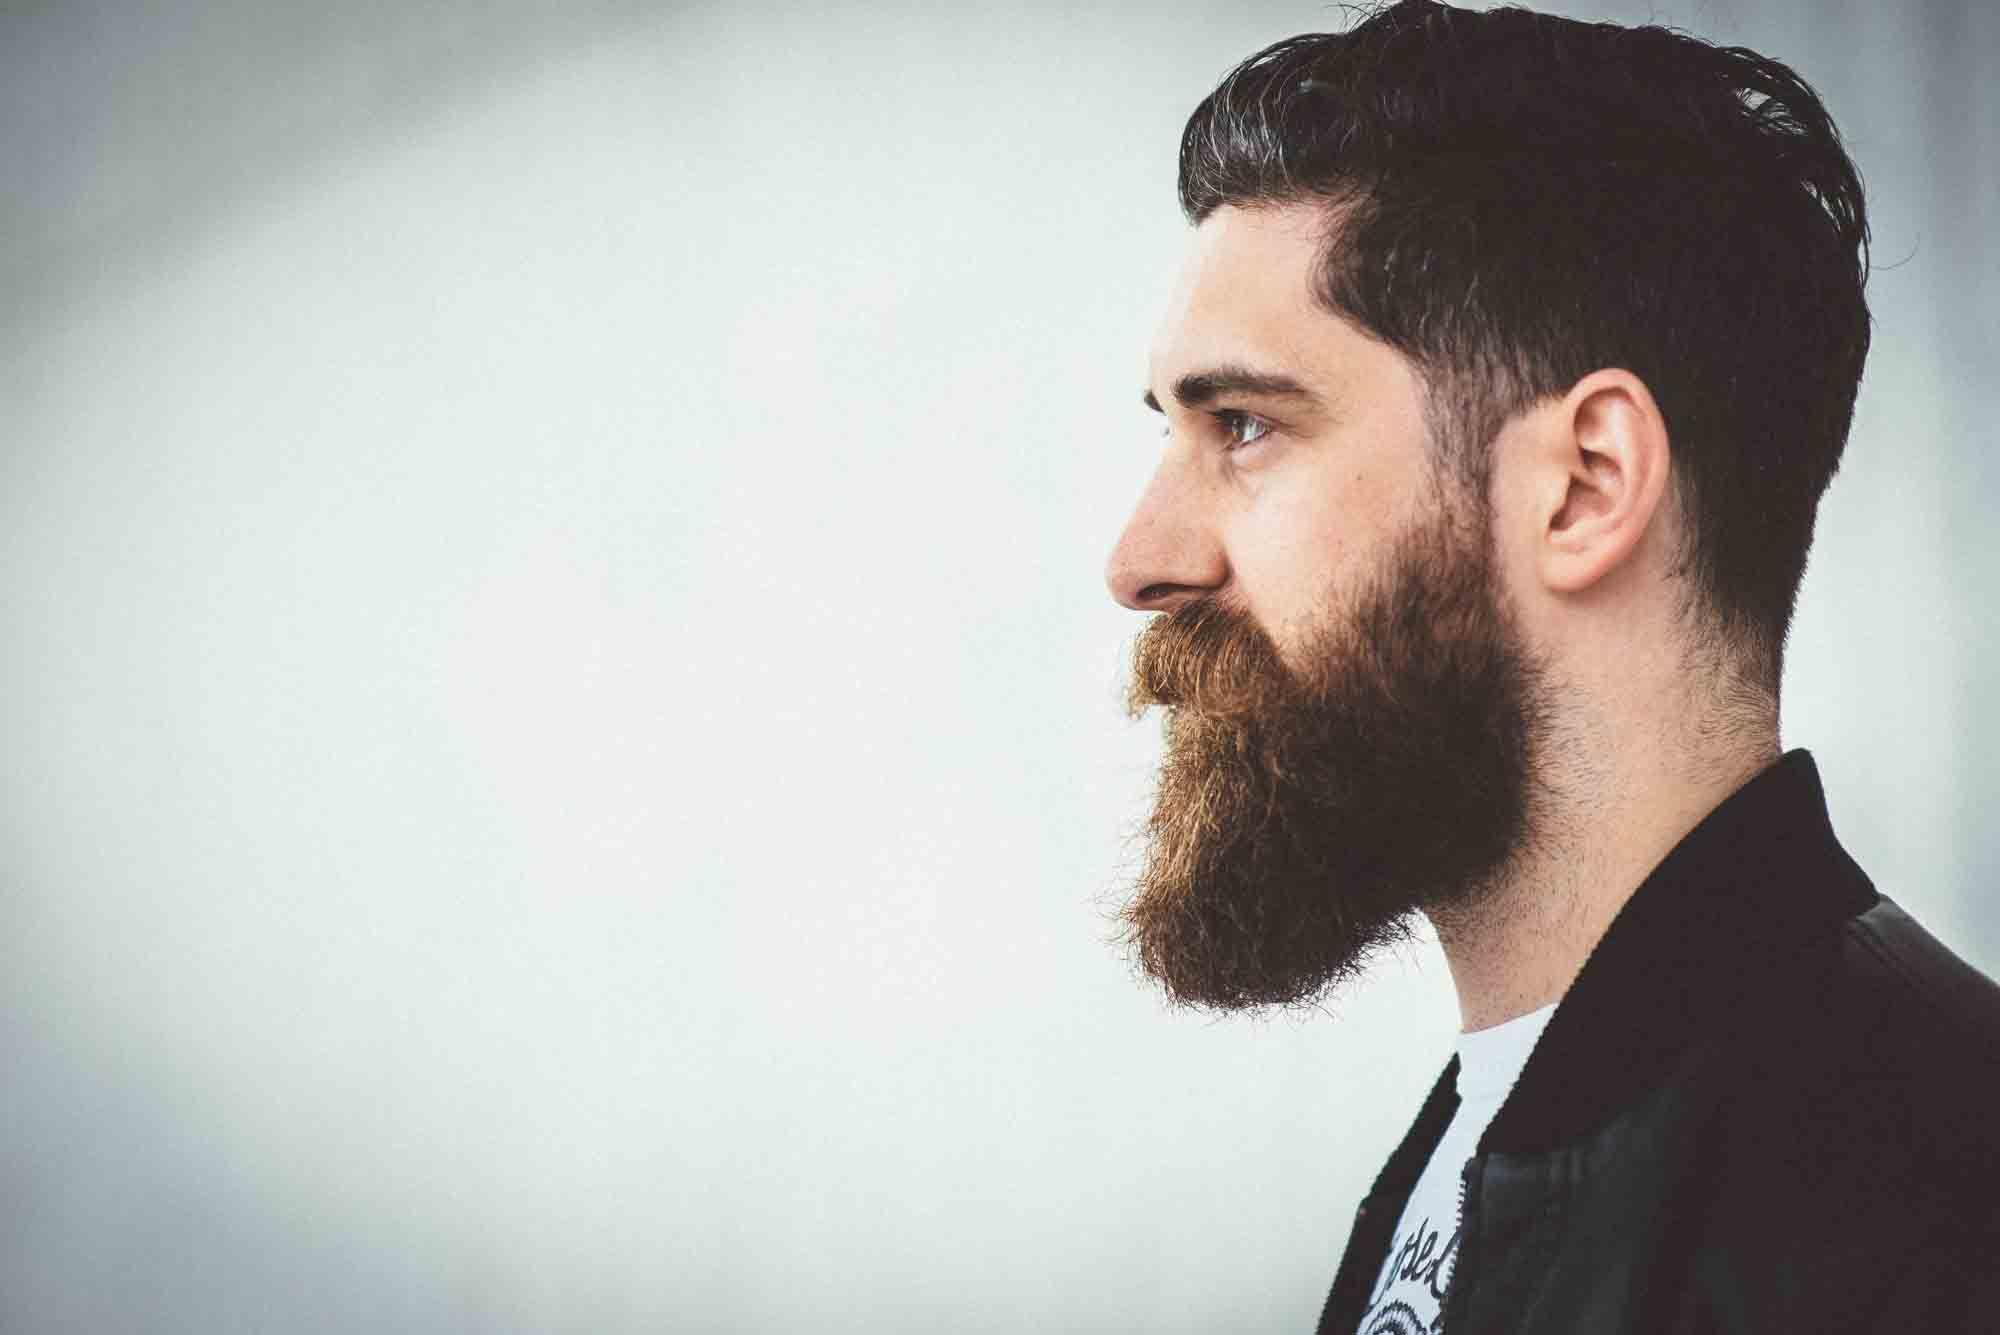 Beard Desktop Wallpapers Top Free Beard Desktop